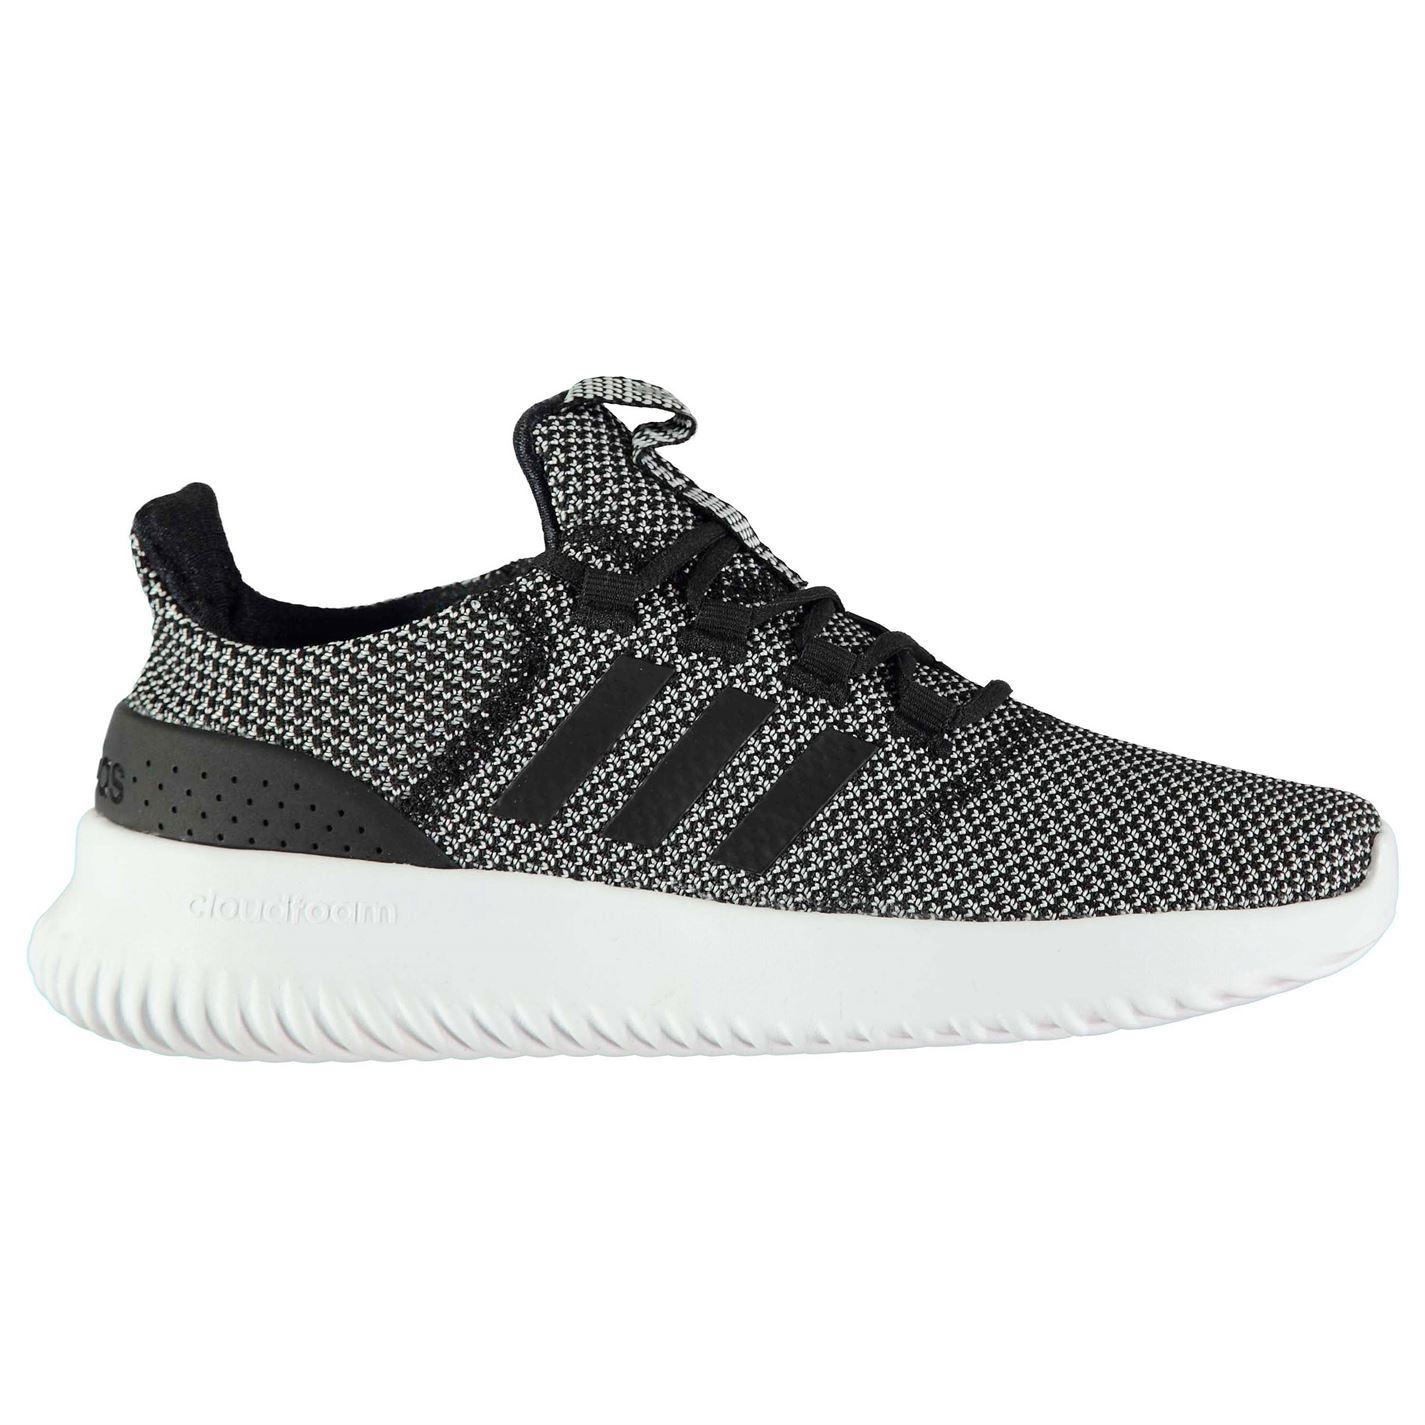 Dettagli su Adidas Cloudfoam Ultimate Scarpe per Ragazzi Scarpe